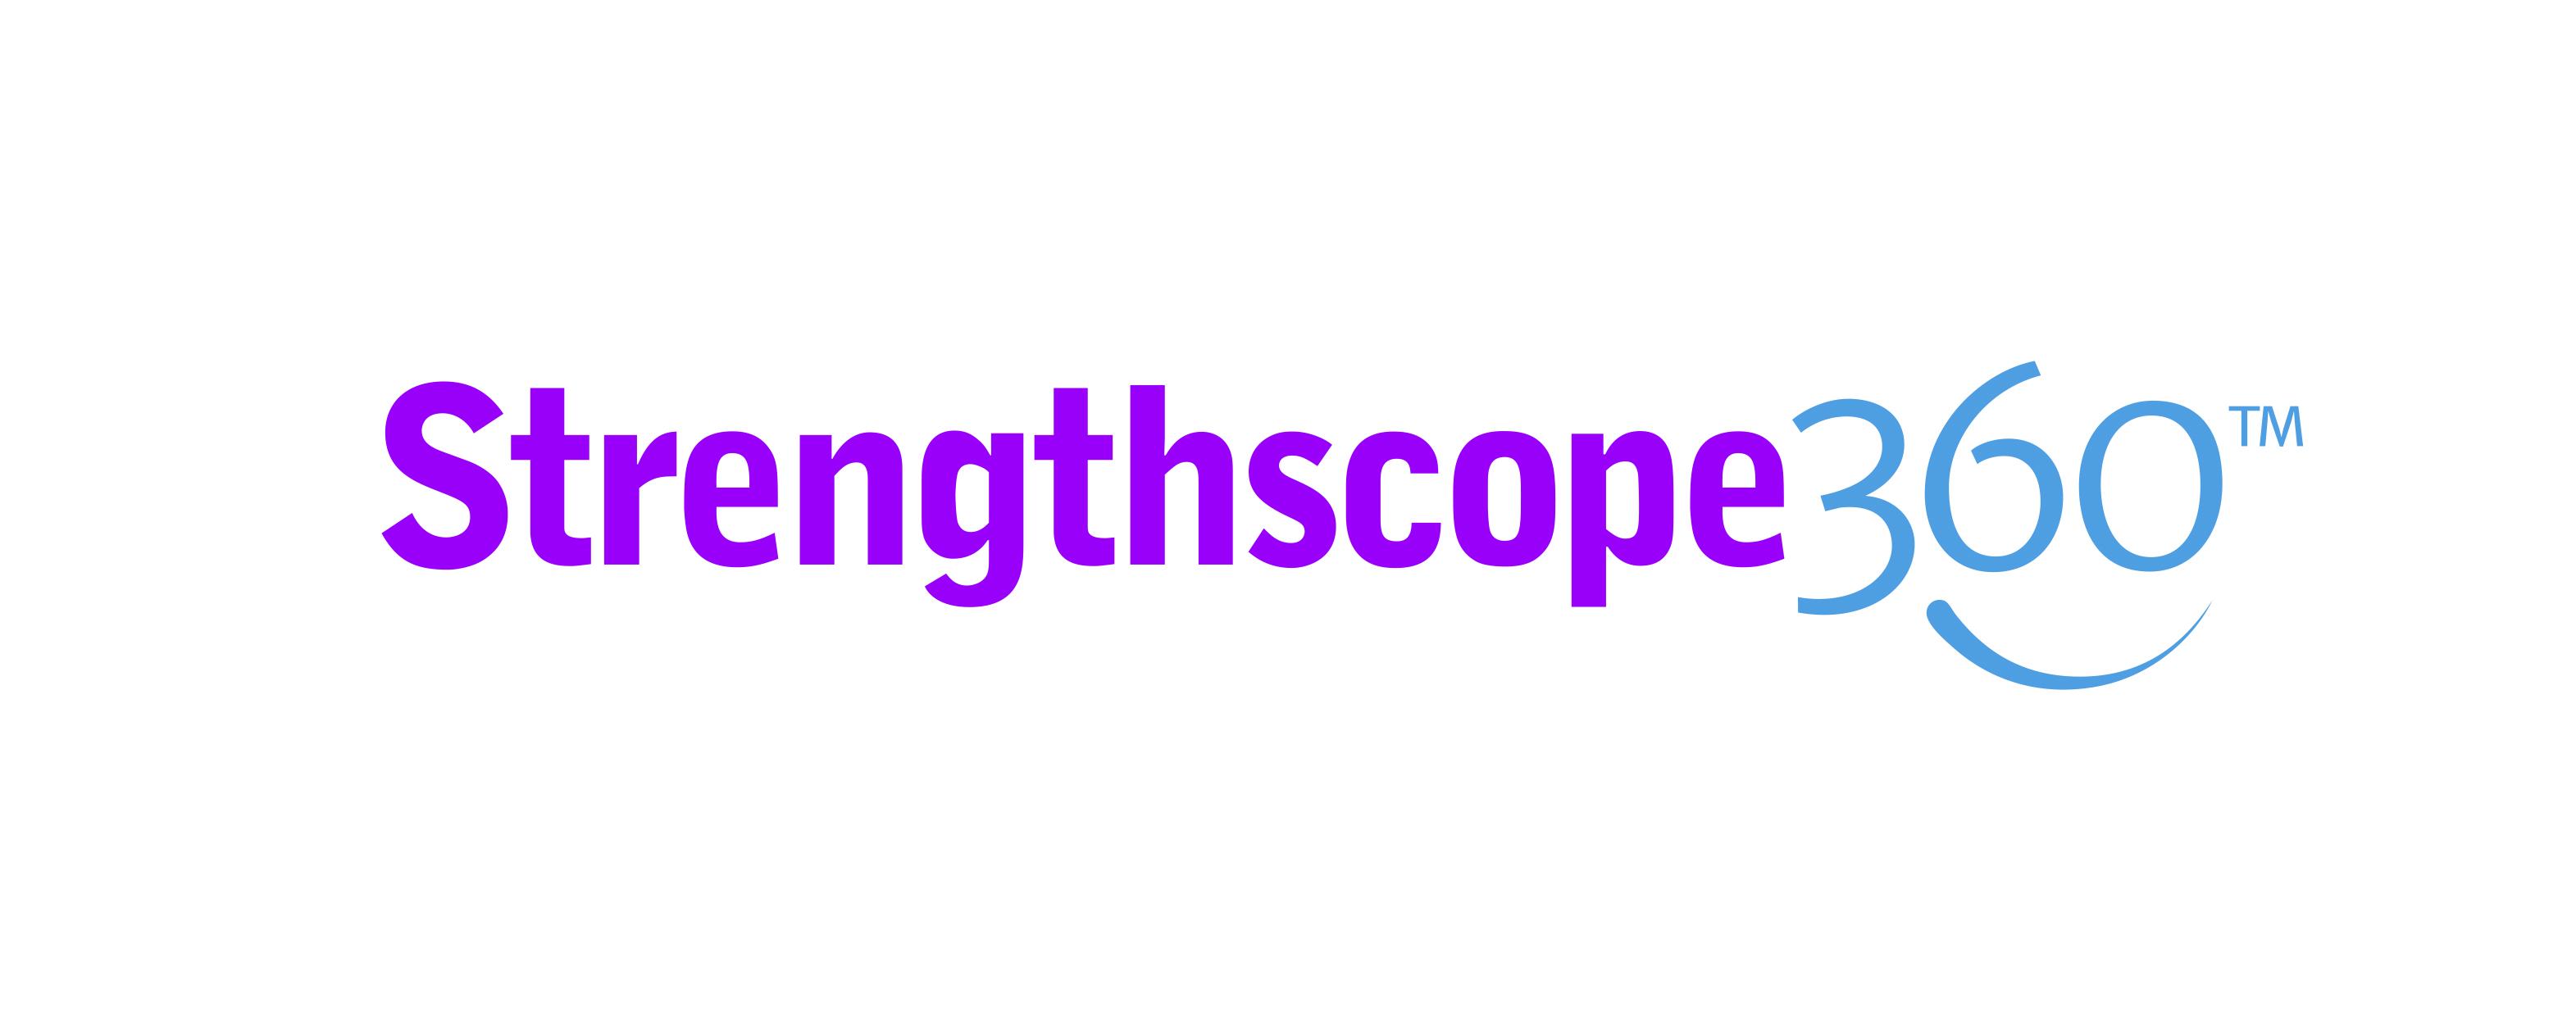 strengthscope360_logo